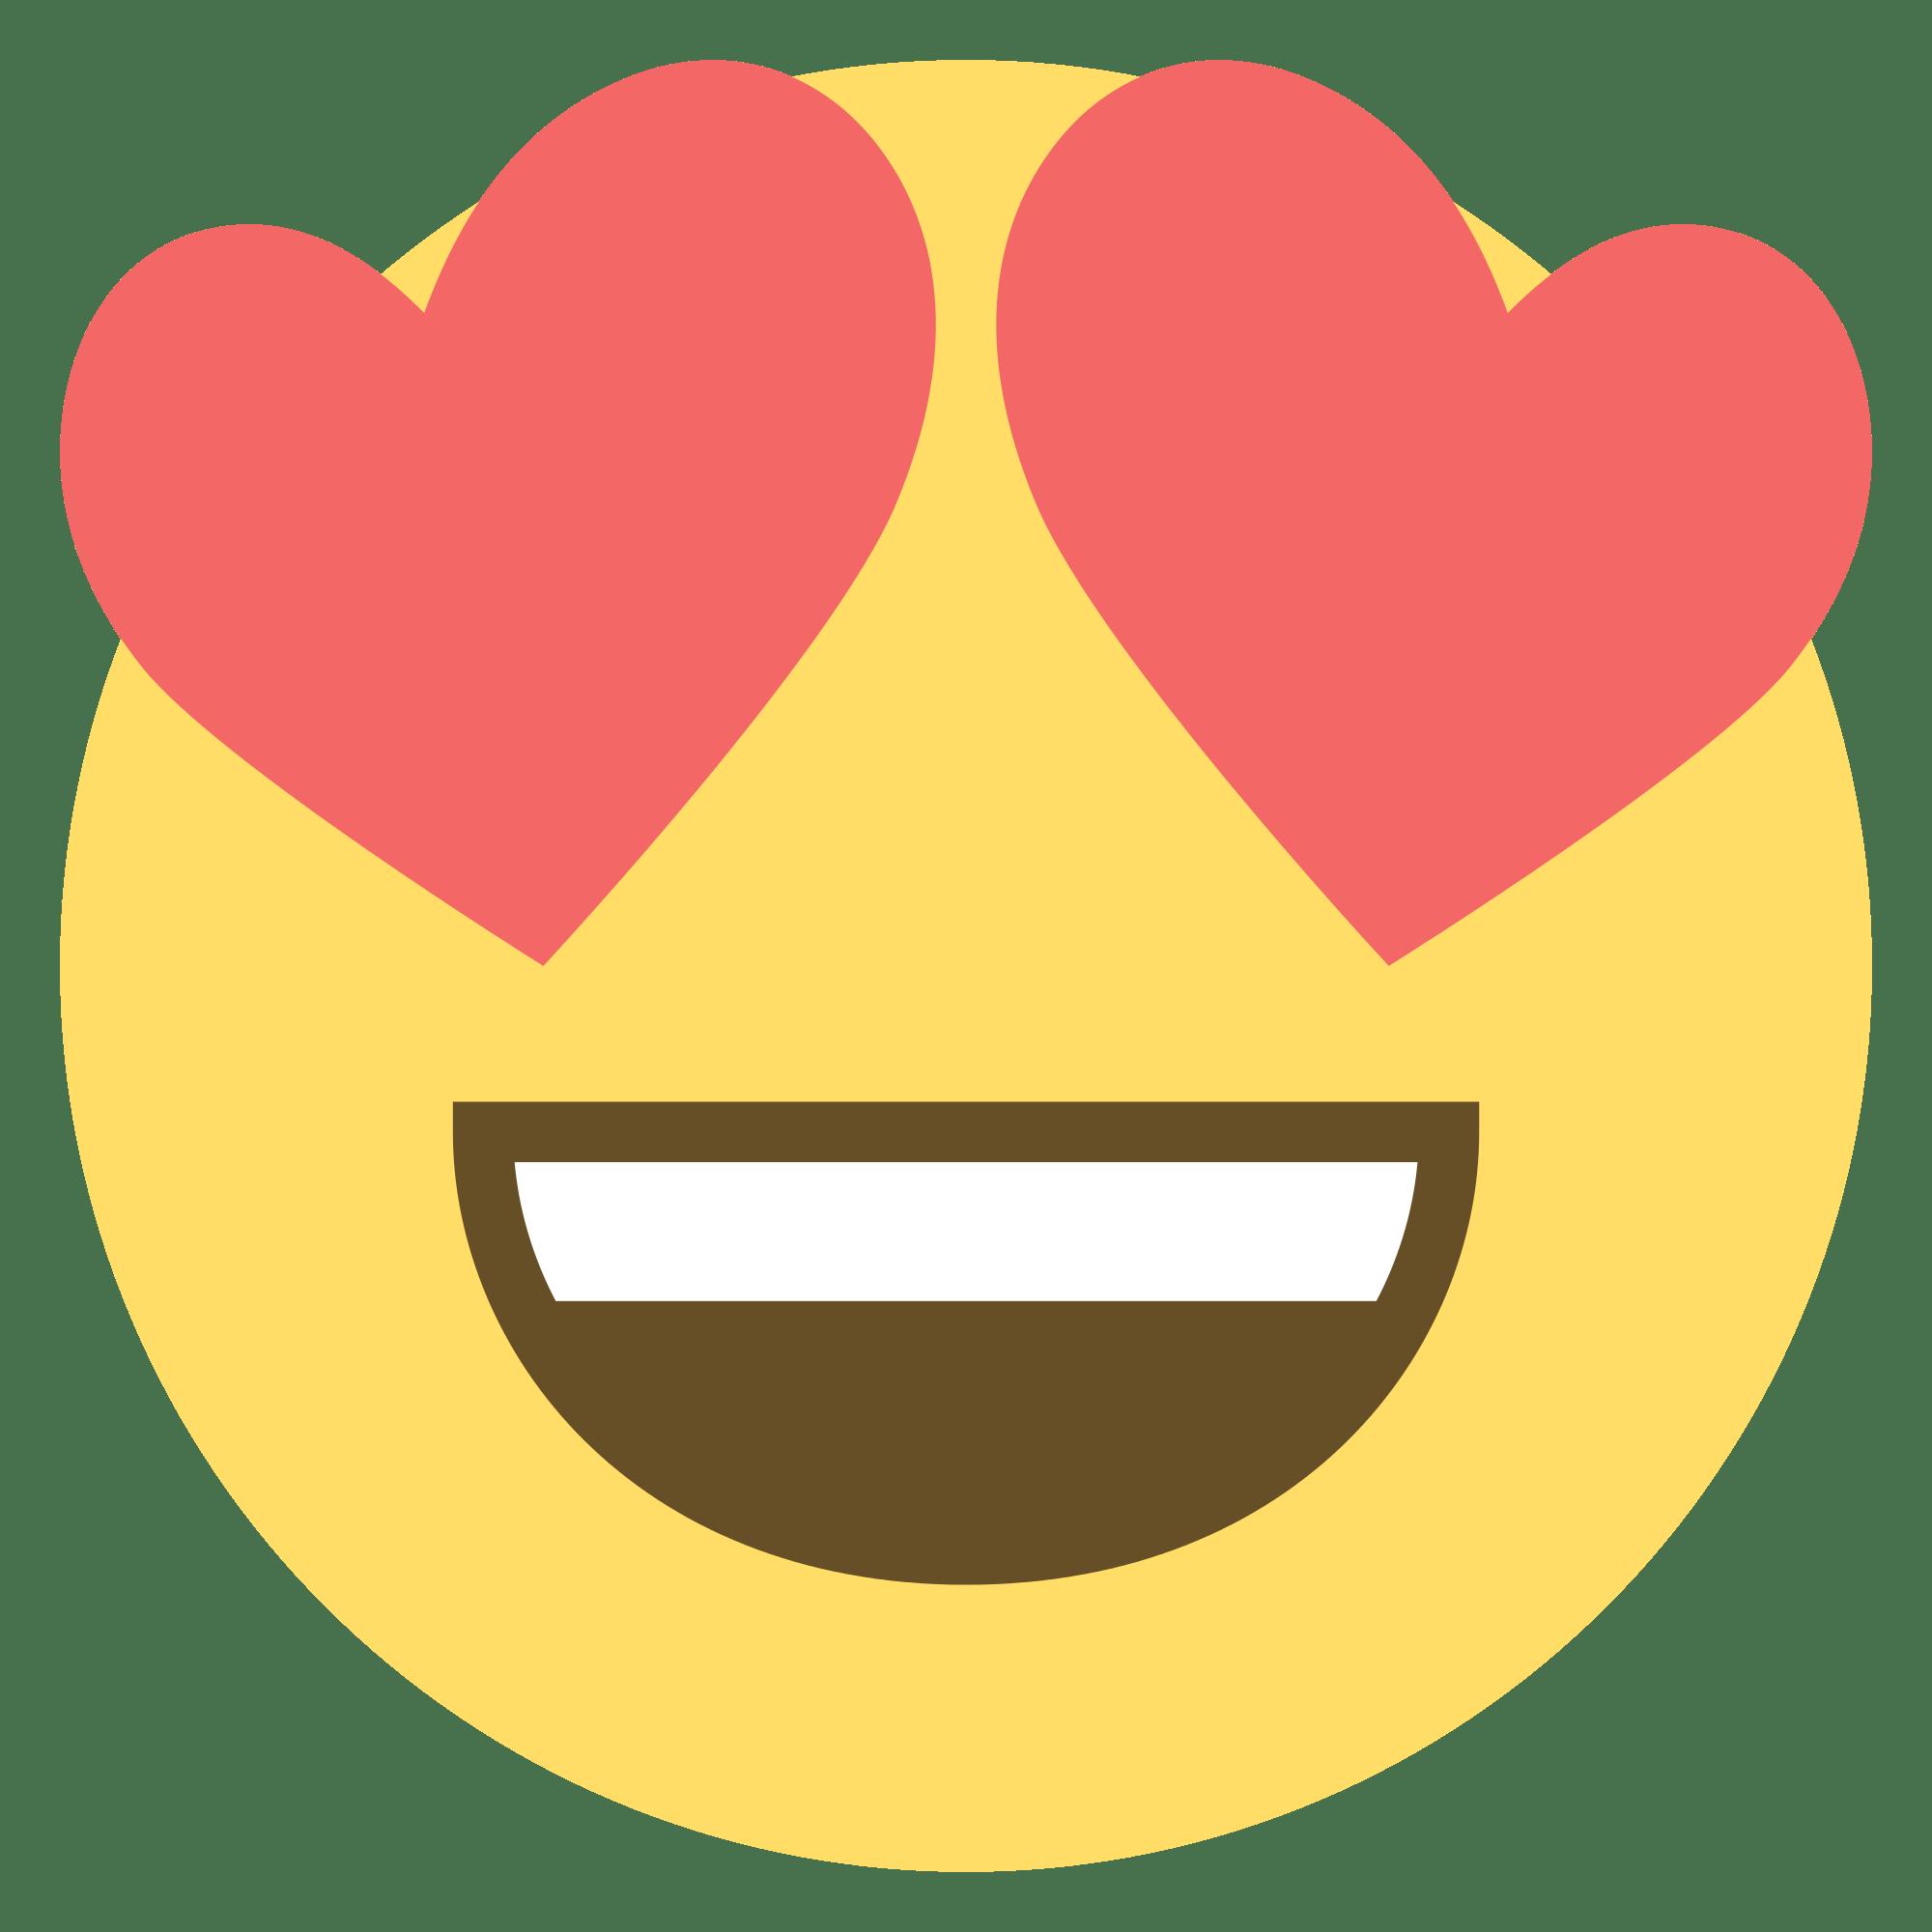 Love Emoji - Emoji, Transparent background PNG HD thumbnail